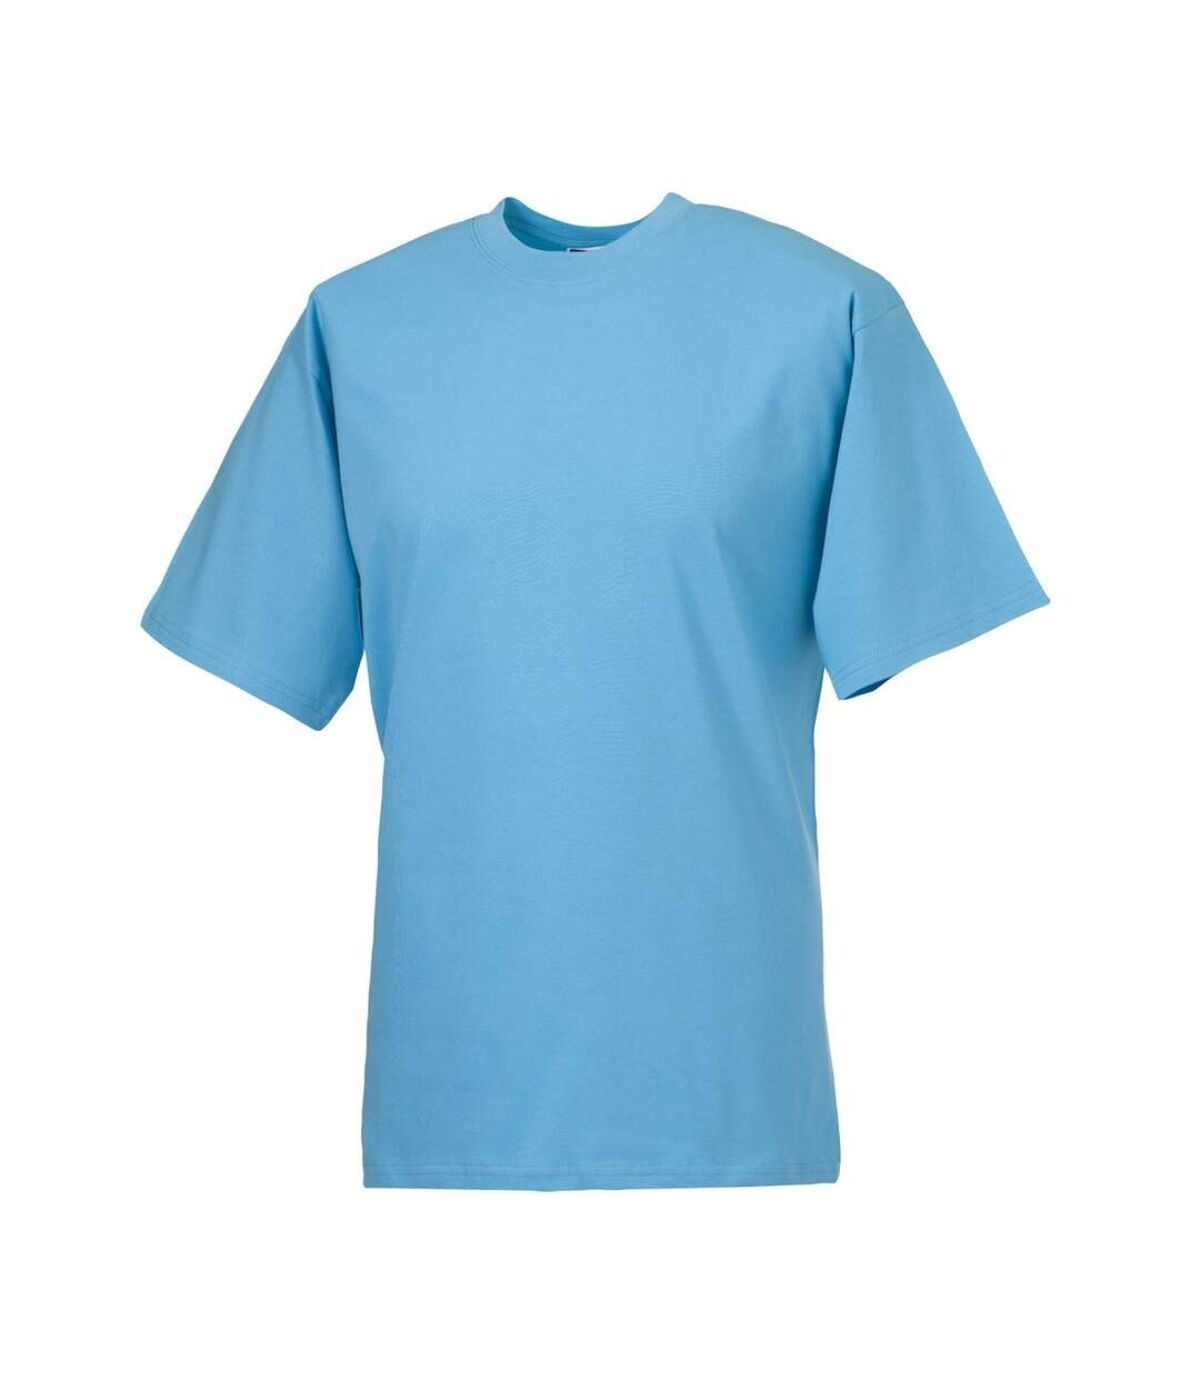 Jerzees Colours Mens Classic Short Sleeve T-Shirt (Sky Blue) - UTBC577